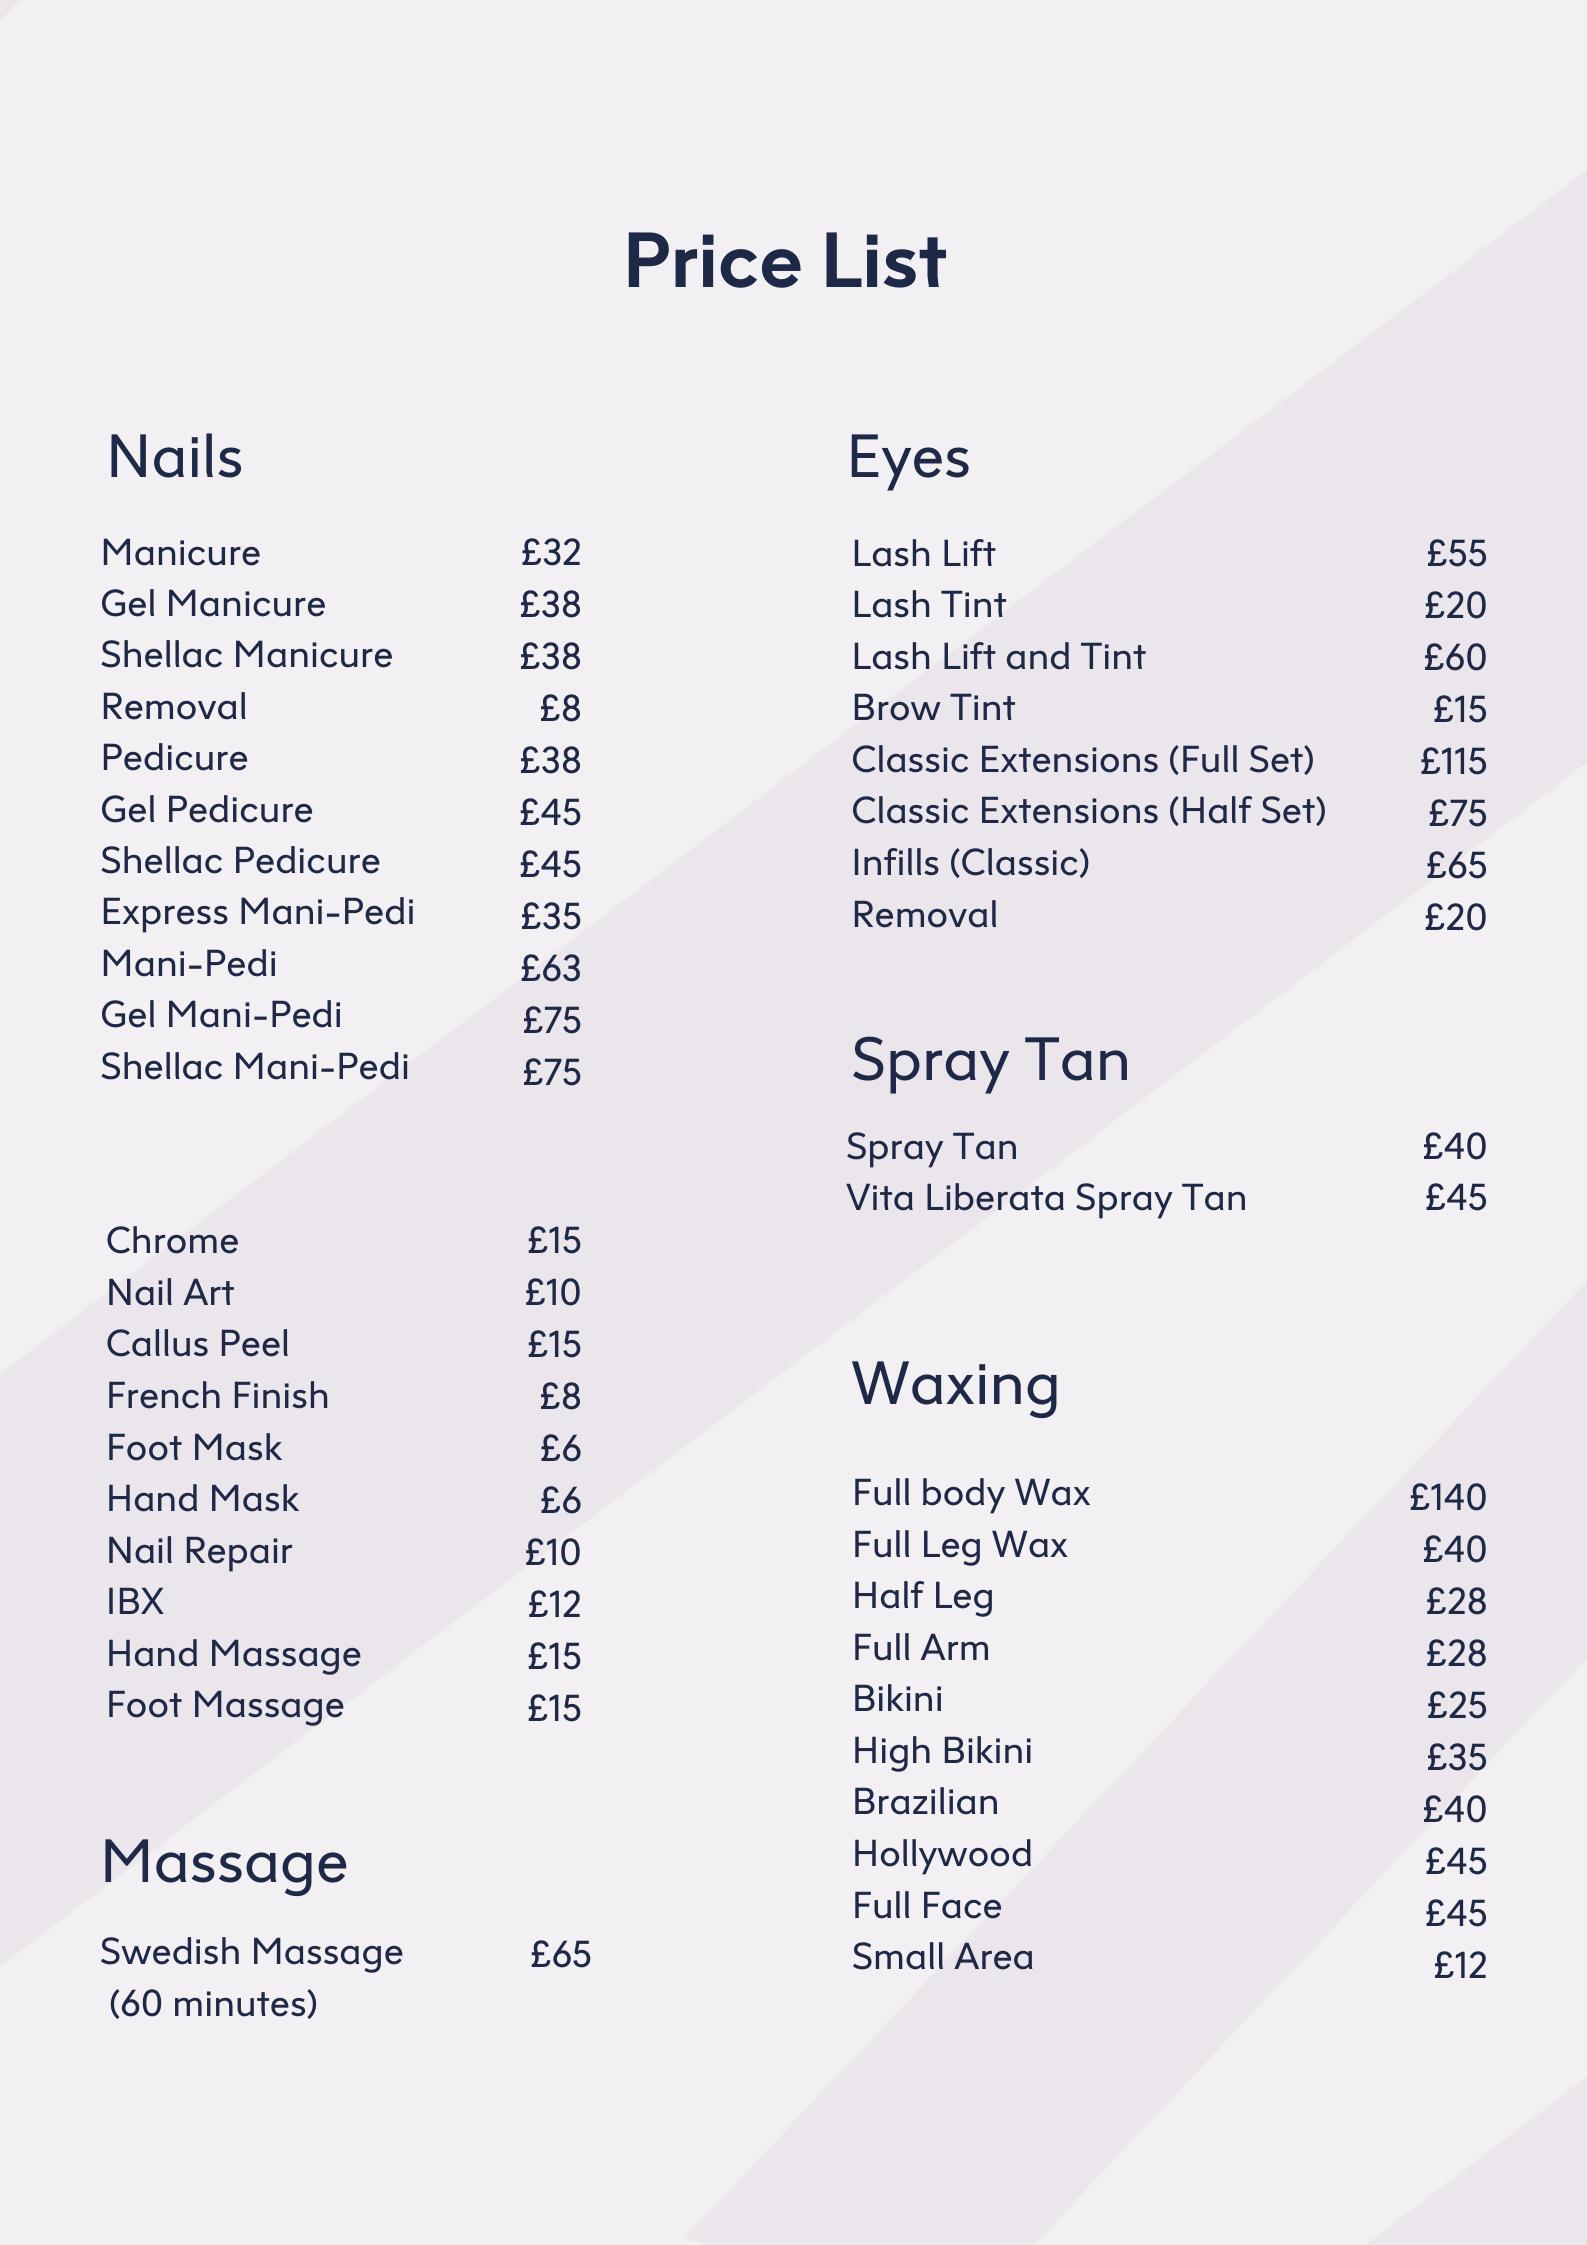 LeSalon Price List